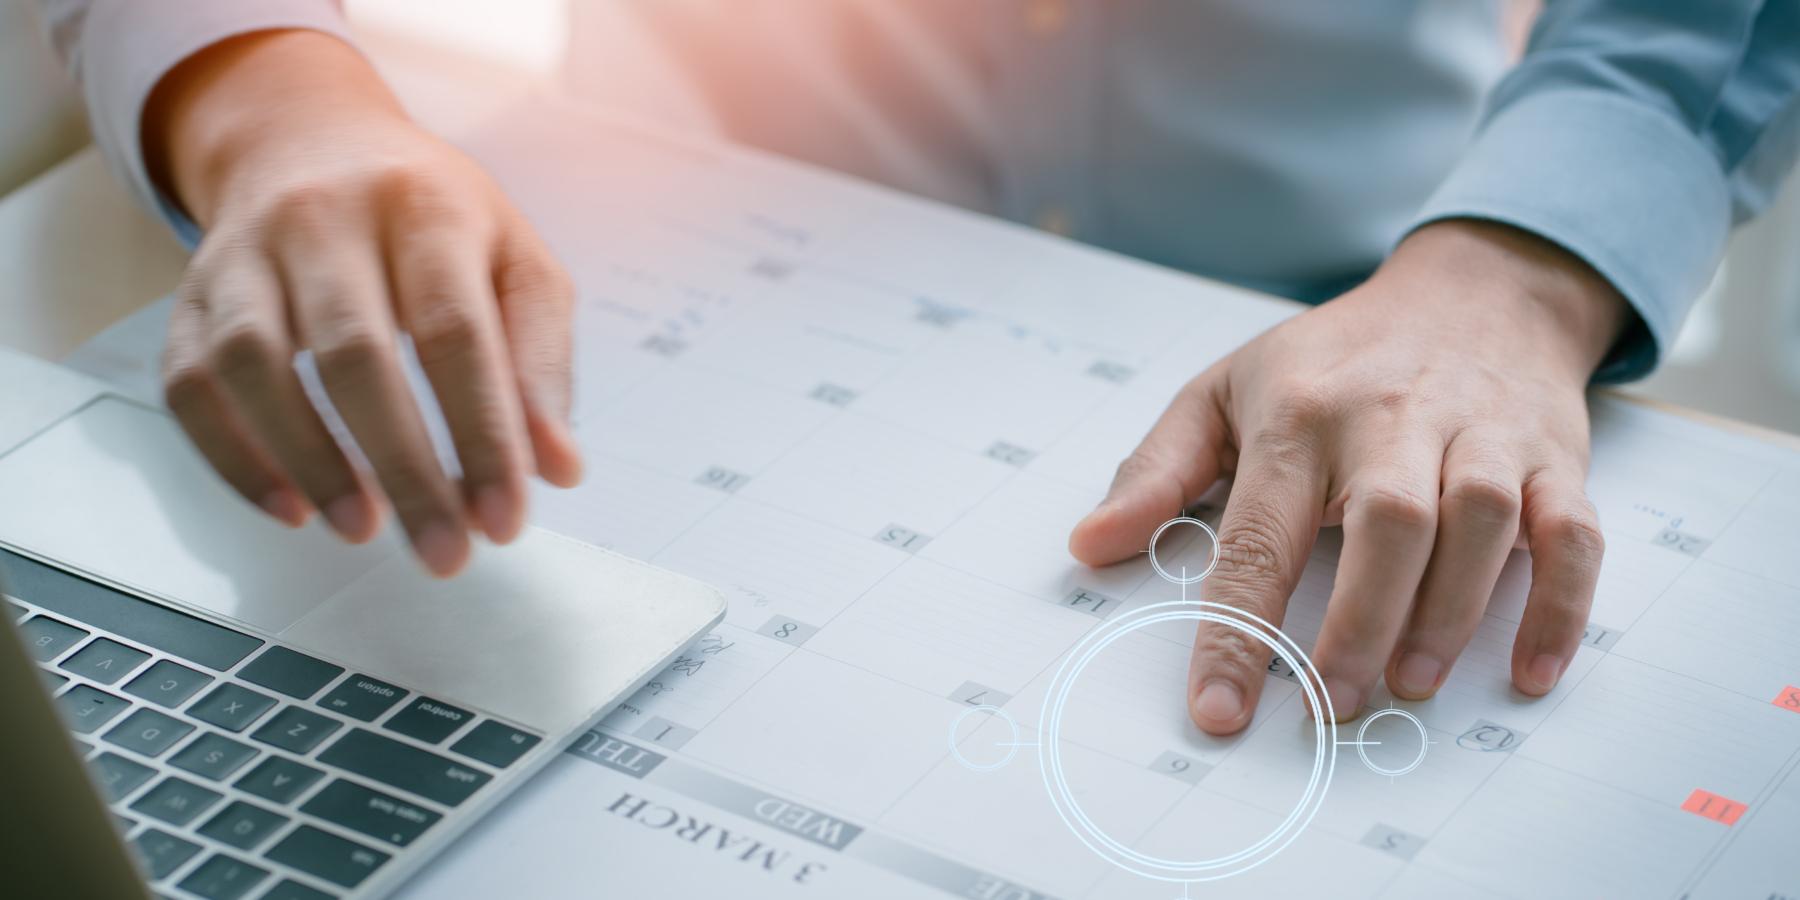 Kreatywne sposoby nareklamę – kalendarze i…?